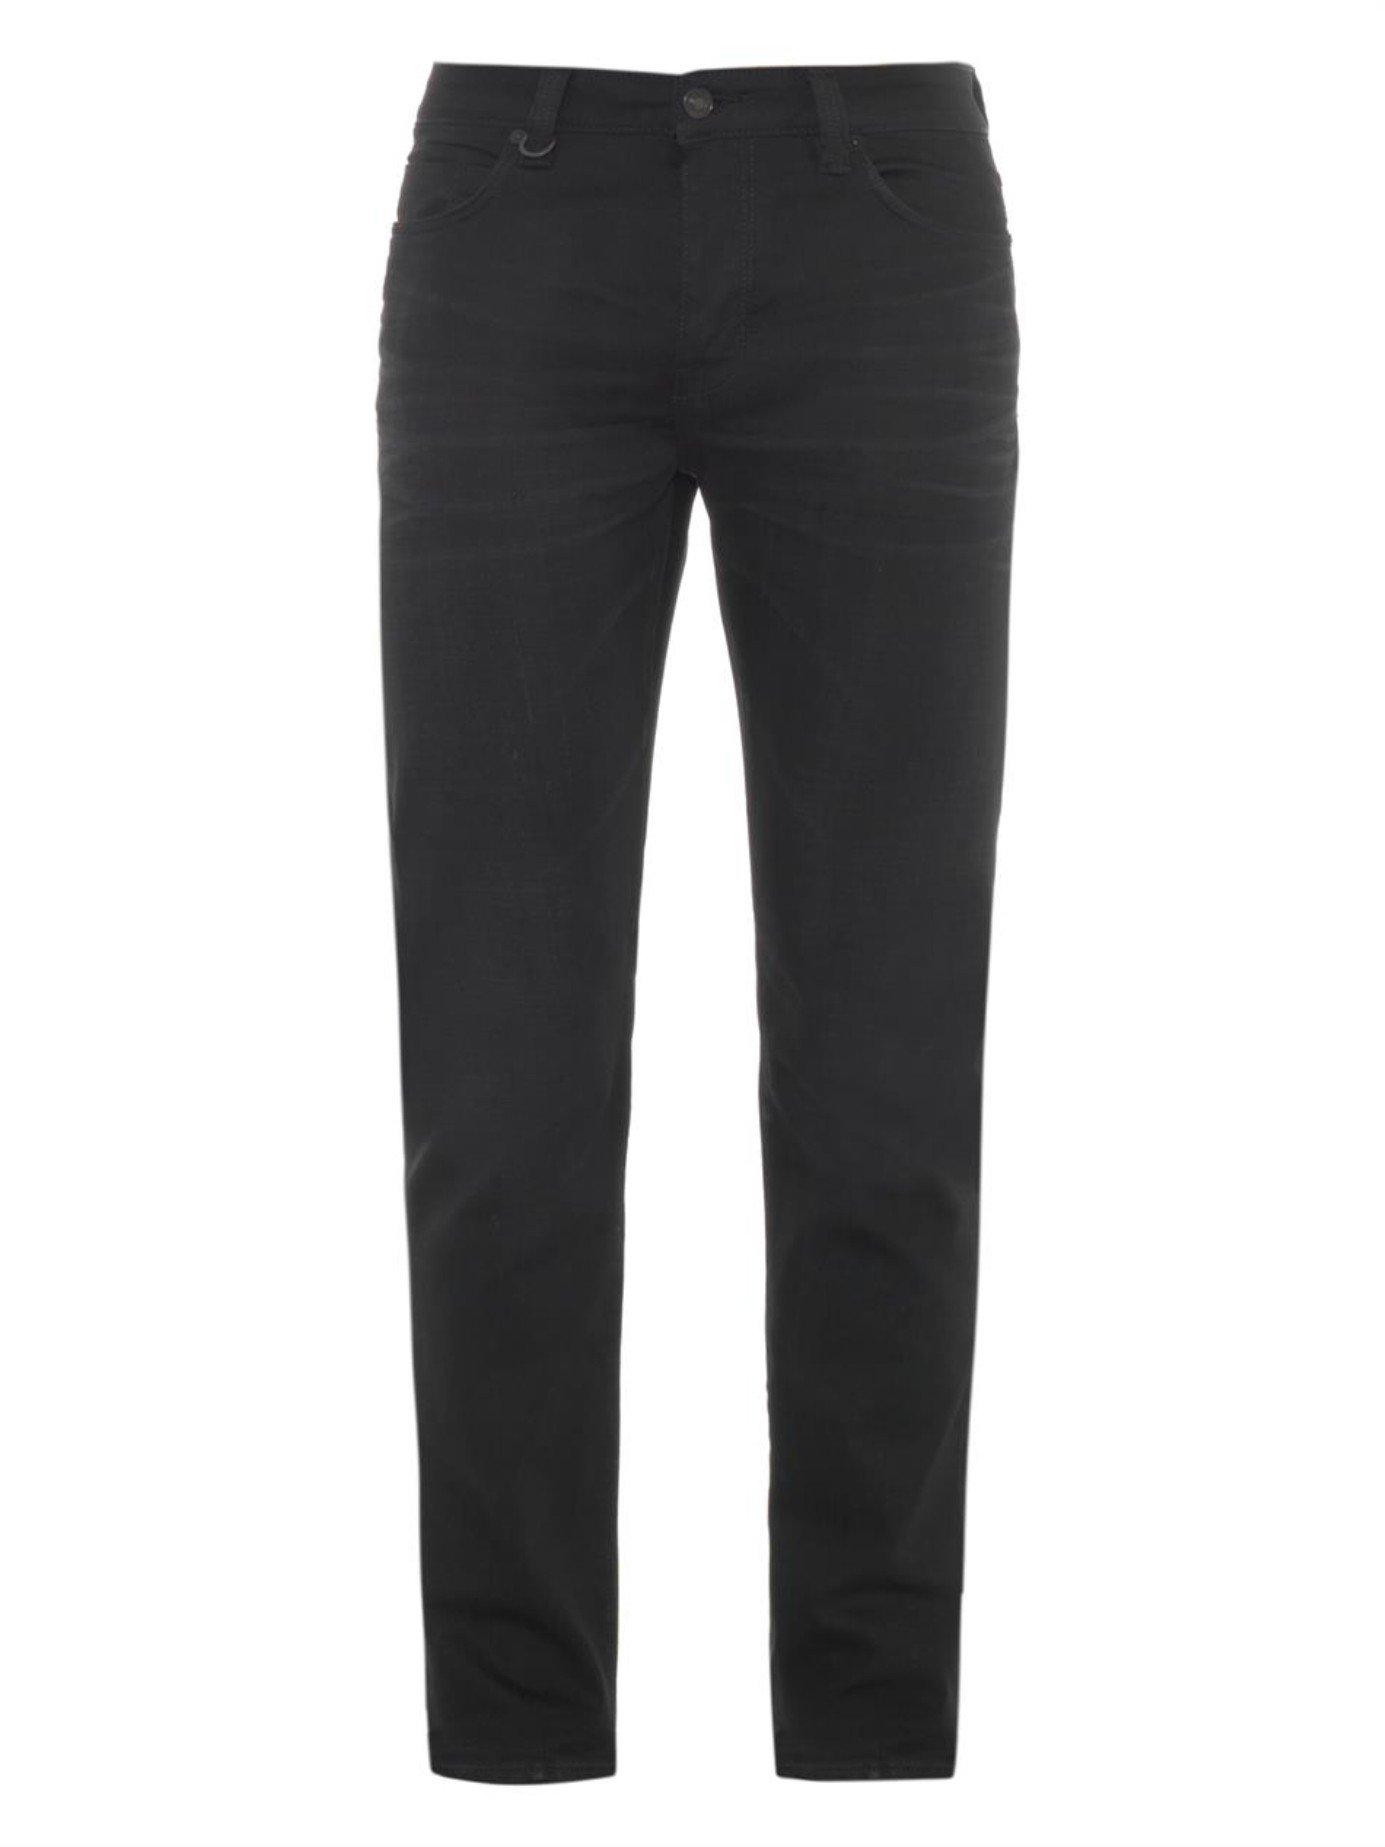 Neuw Iggy Black Rope Skinny-Leg Jeans in Black for Men   Lyst